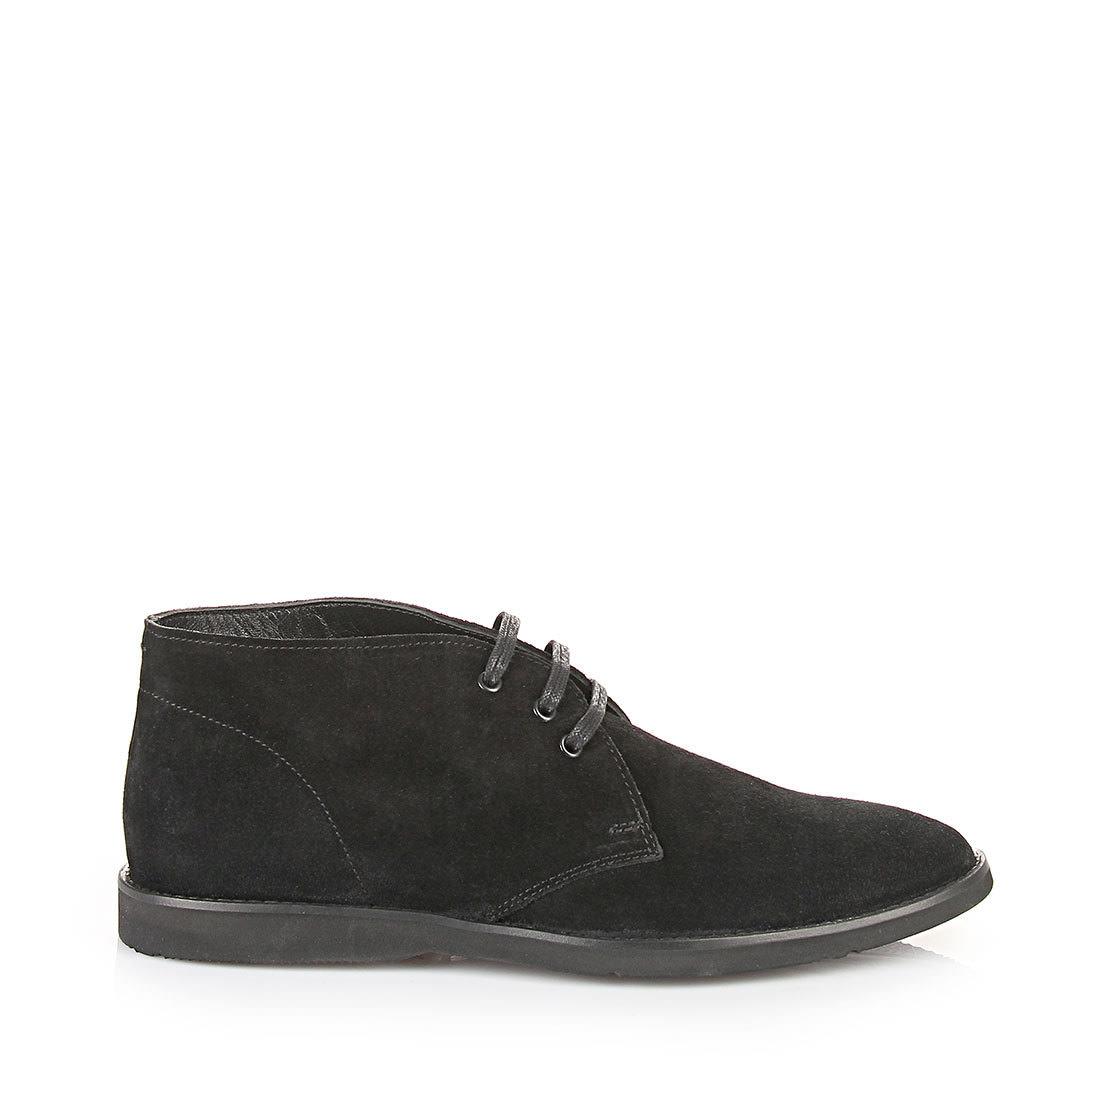 buffalo herren desert boots in schwarz aus veloursleder online kaufen buffalo. Black Bedroom Furniture Sets. Home Design Ideas